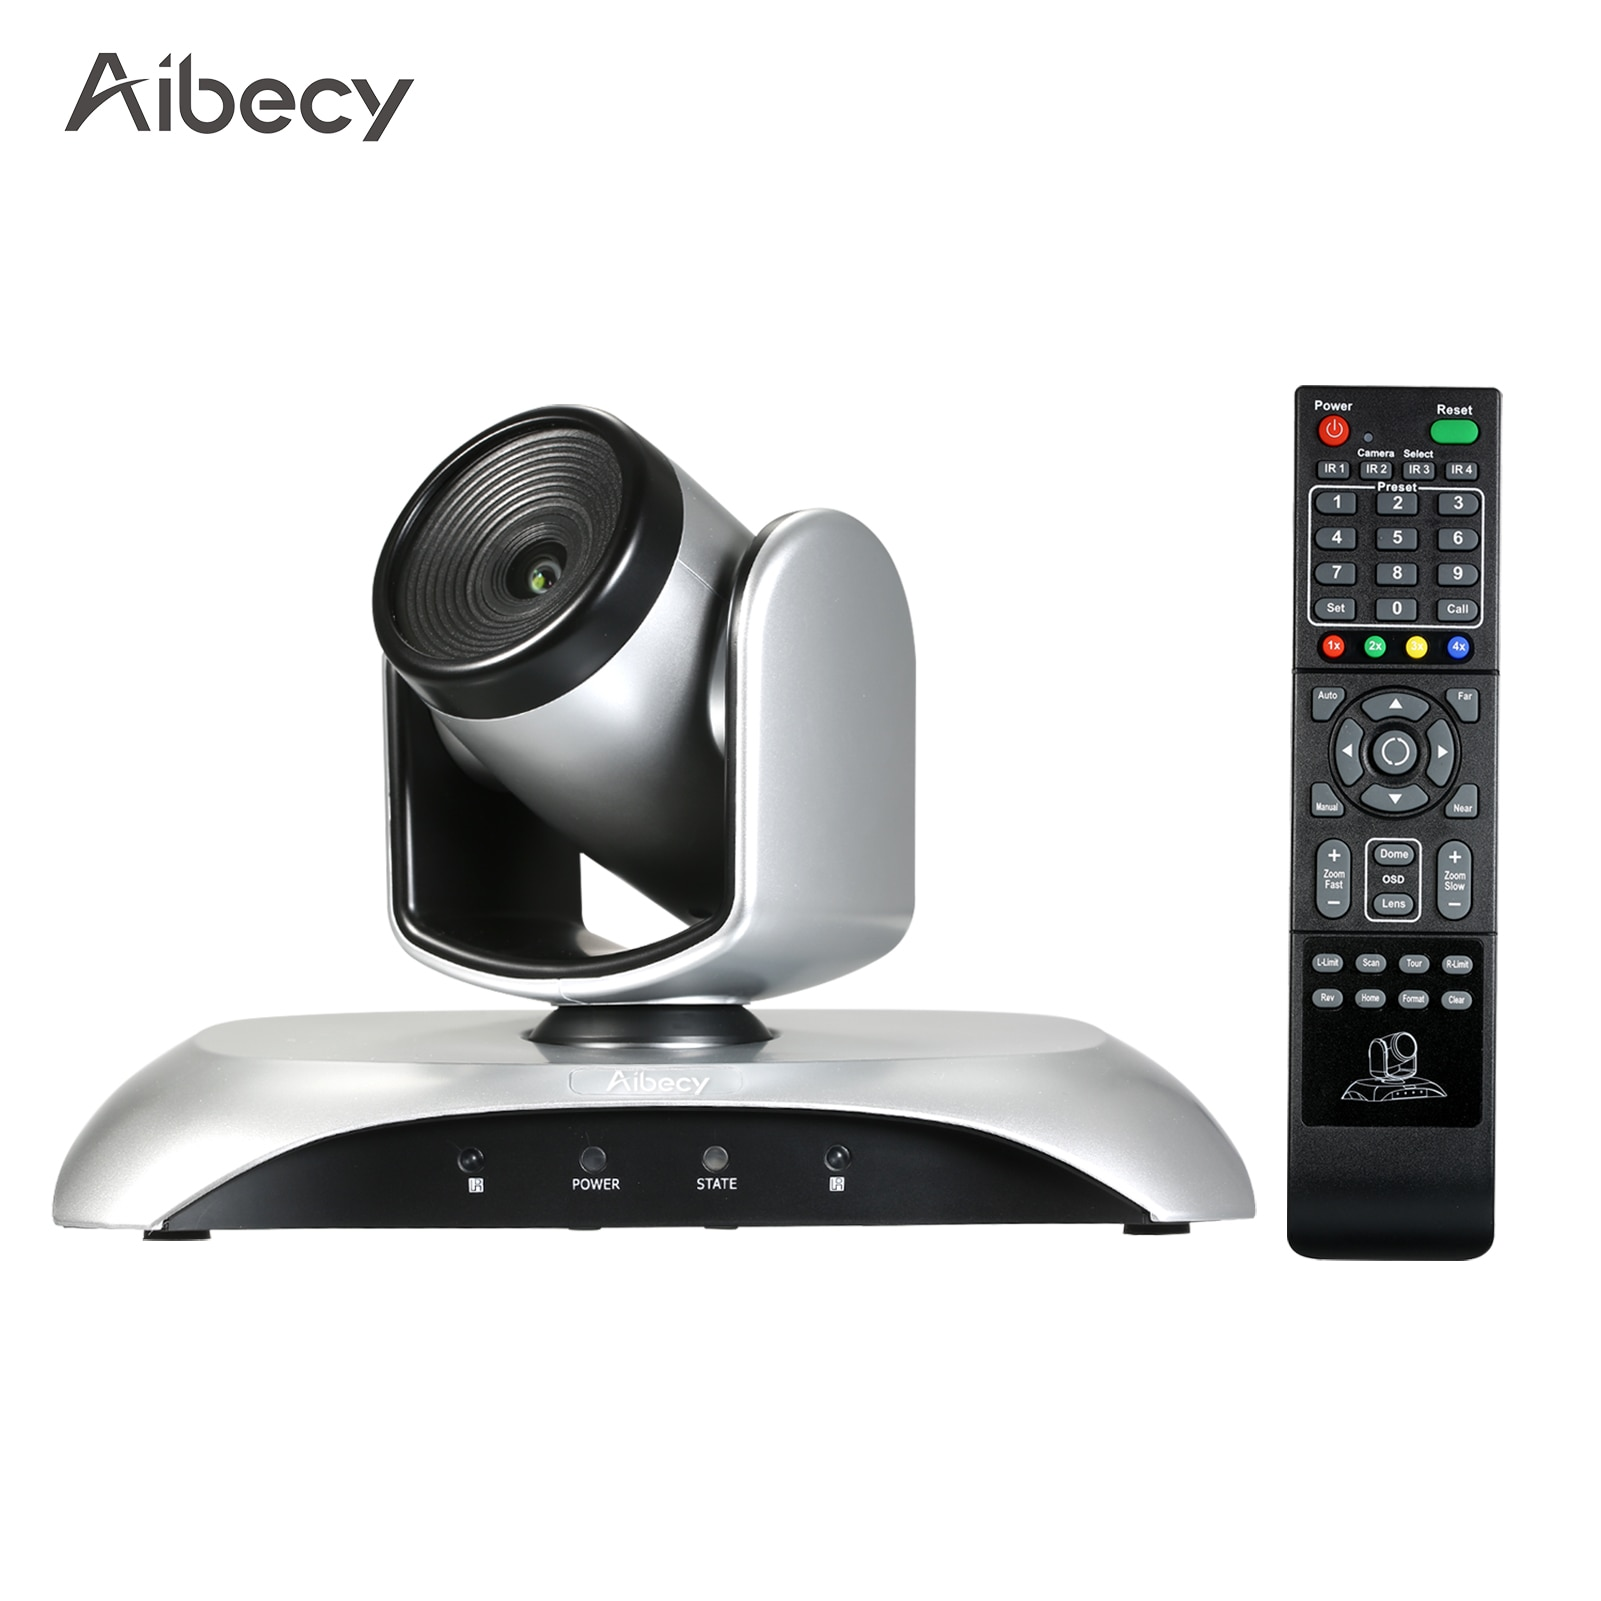 Aibecy 1080P كاميرا فيديو للمؤتمرات 10X زووم بصري زاوية واسعة كاميرا ويب ل H.264 ضغط الصلب 355 درجة دوران للاجتماعات